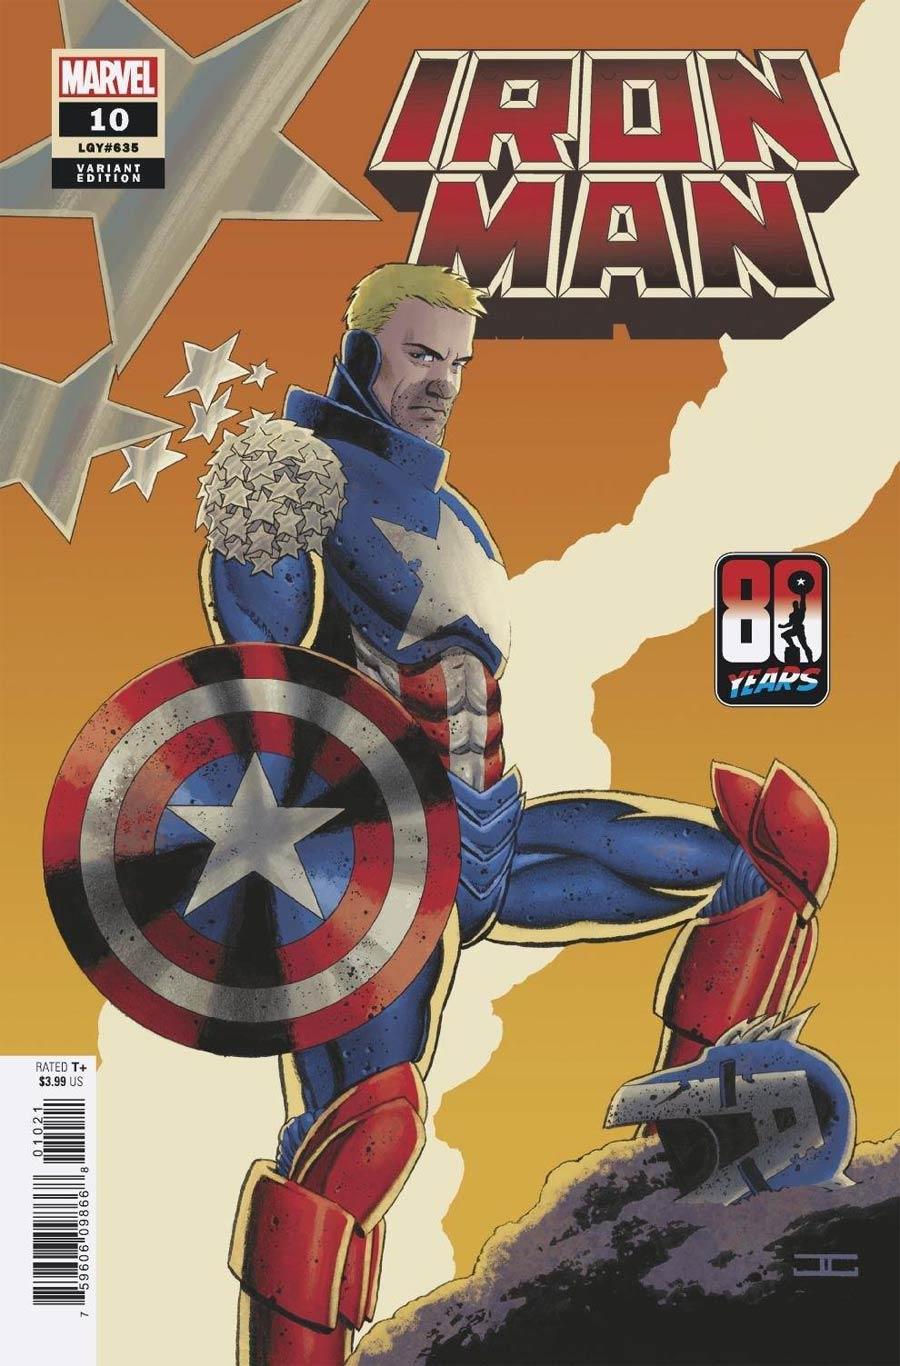 Iron Man Vol 6 #10 Cover B Variant John Cassaday Captain America 80th Anniversary Cover